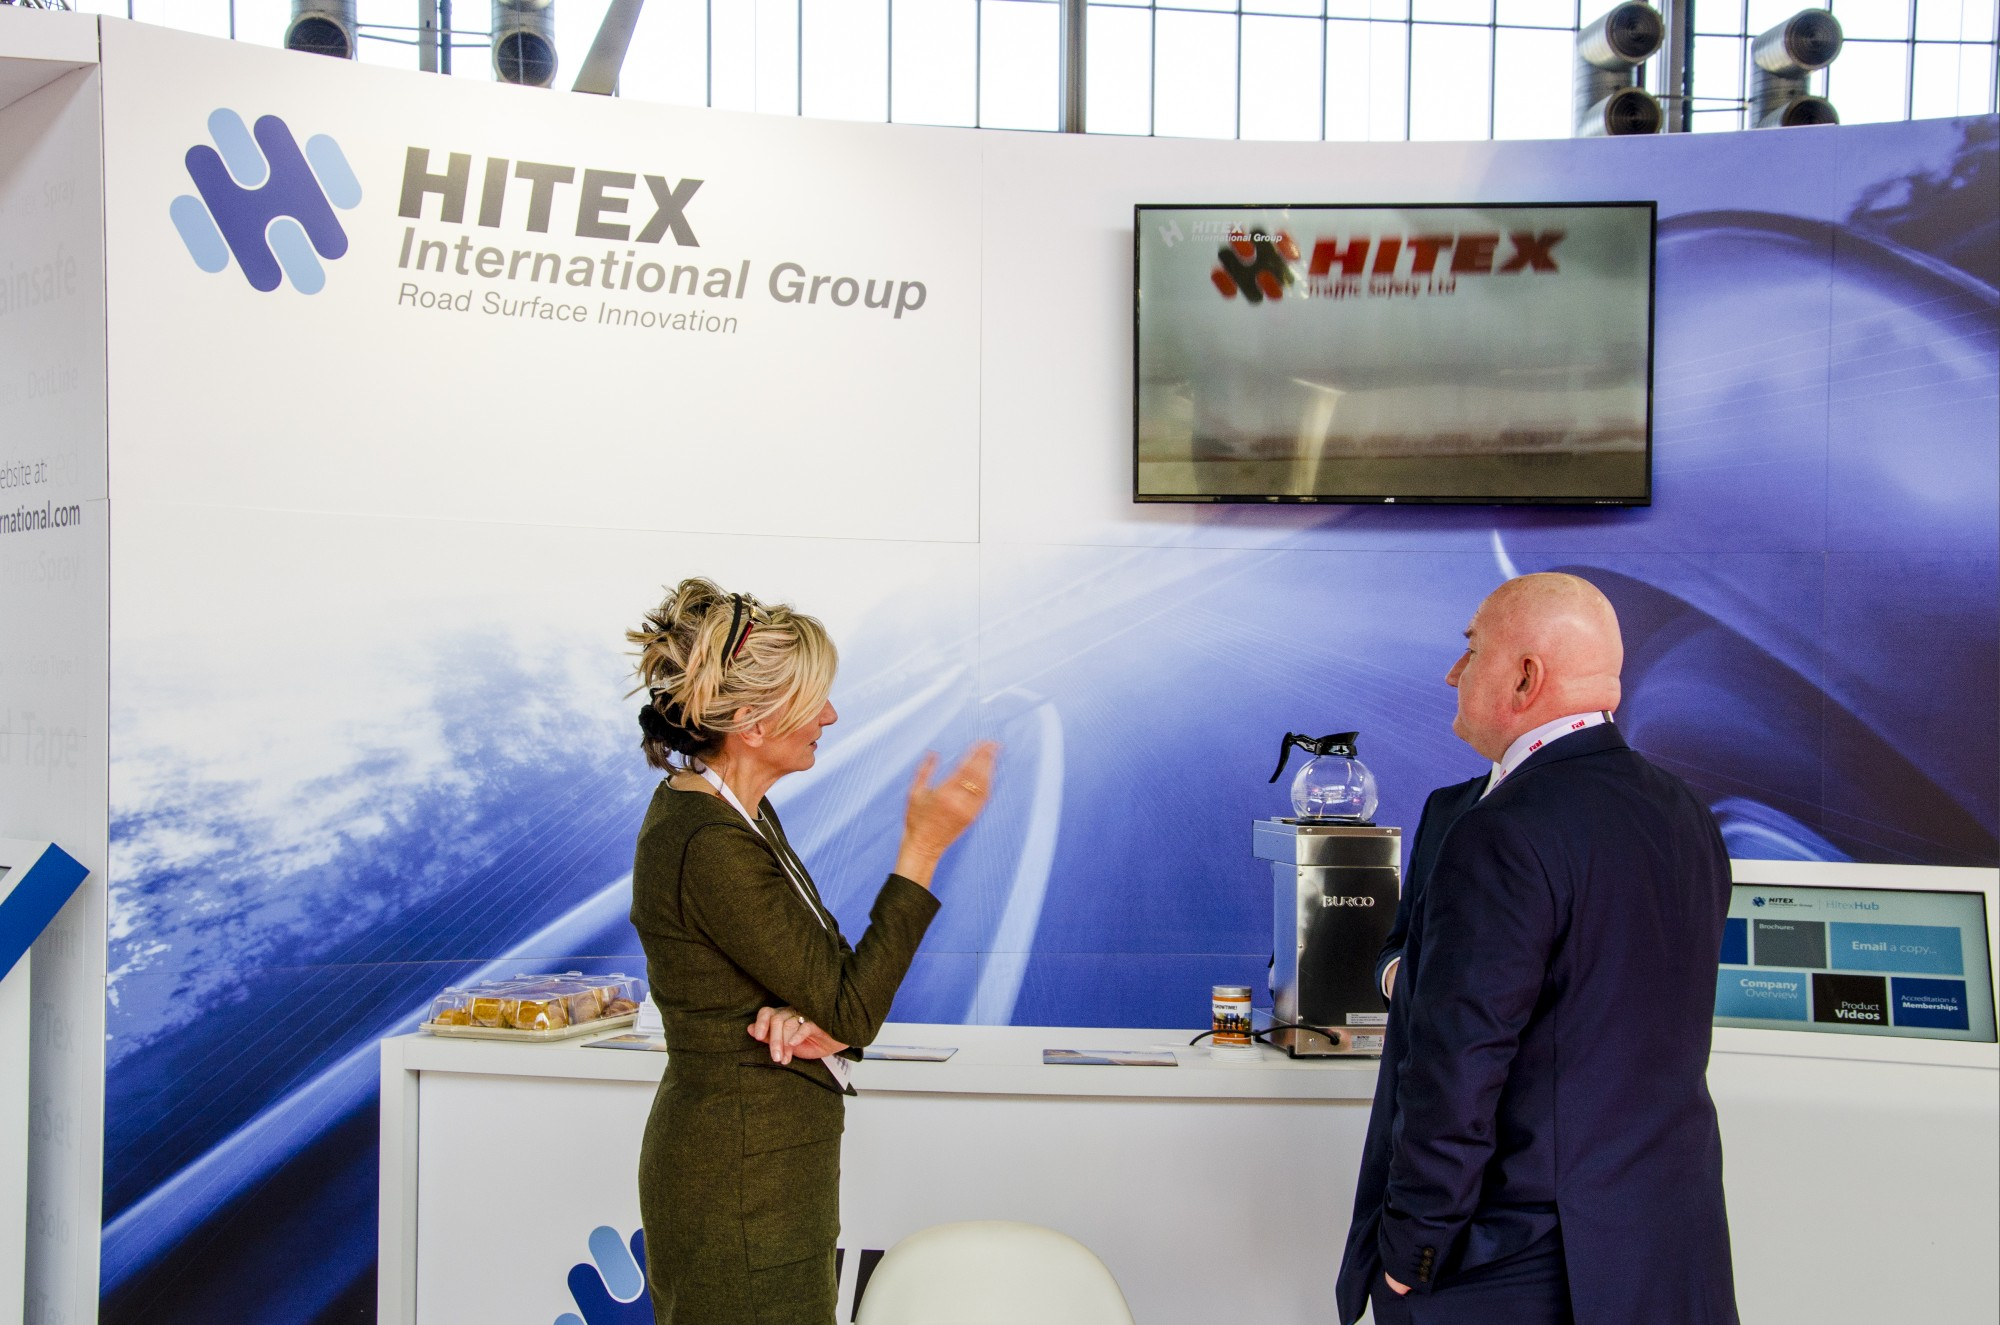 Hitex at Intertraffic 2018 17